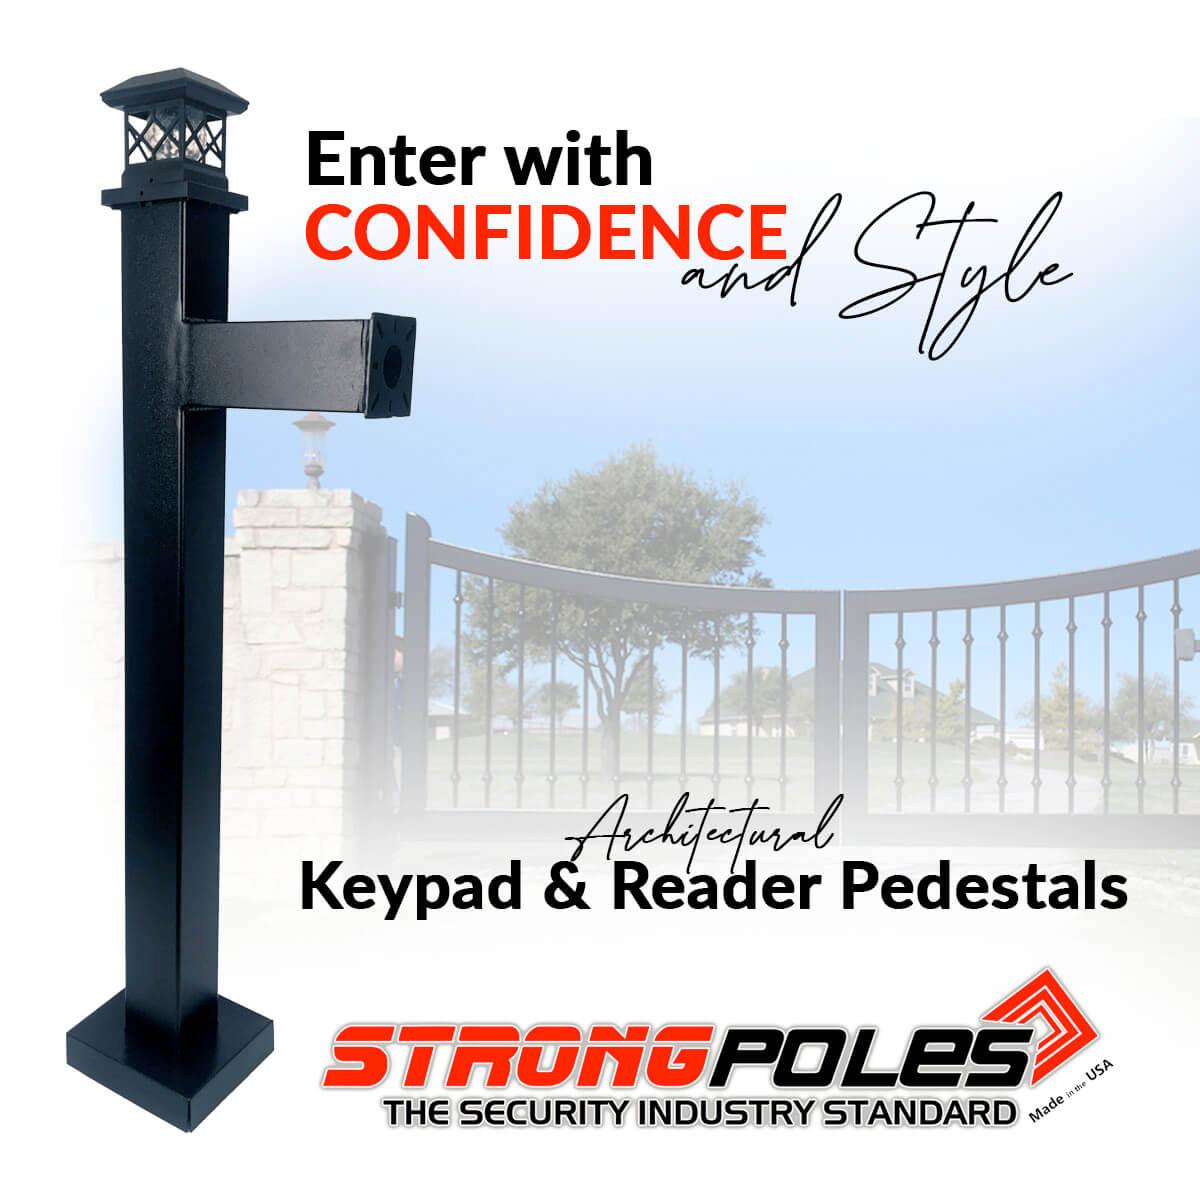 access control keypad and reader pedestal